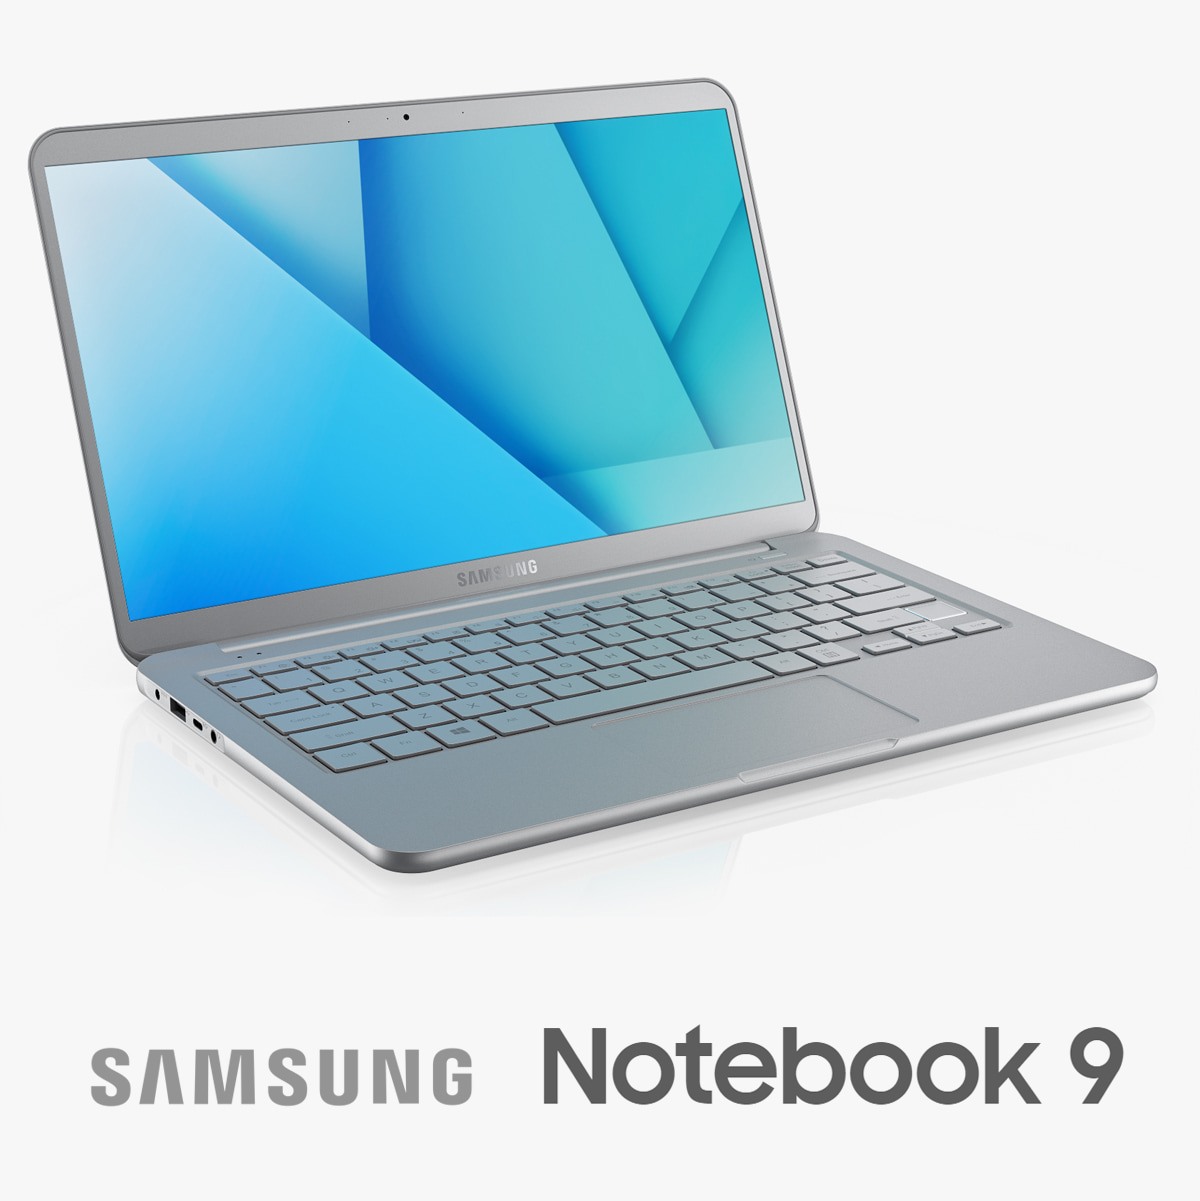 Notebook samsung format - Max Samsung Notebook 9 2017